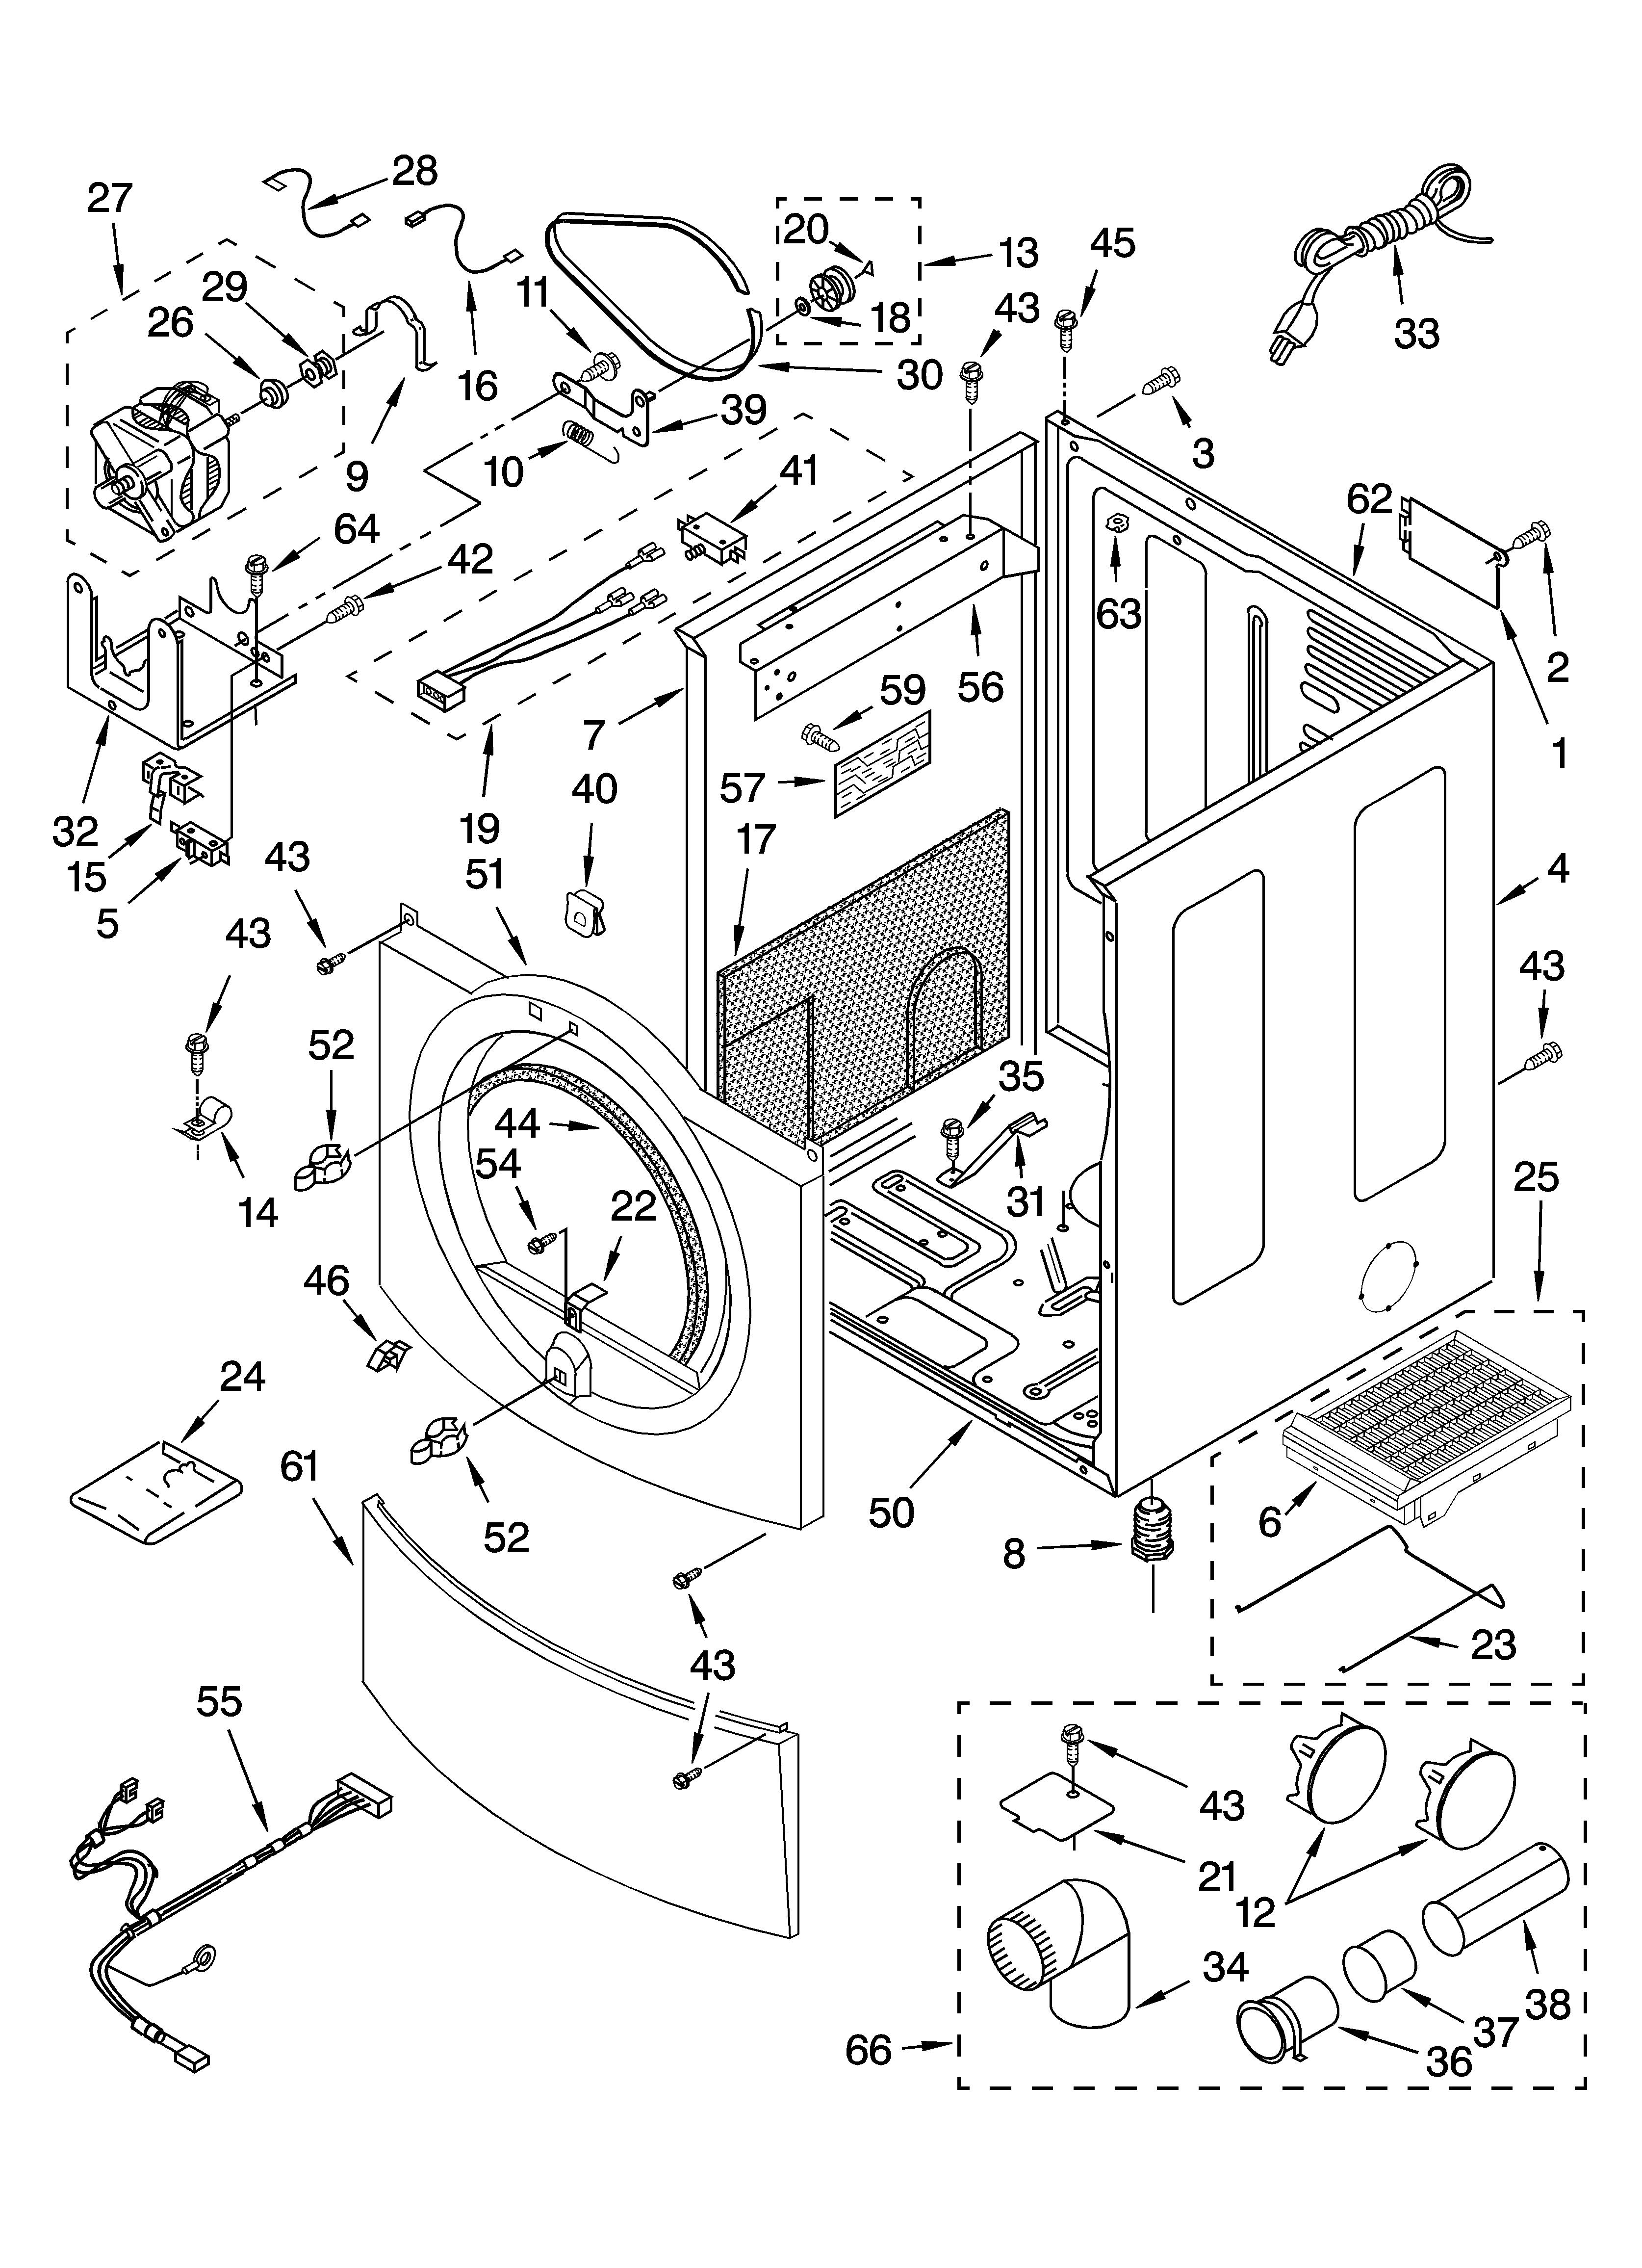 GL_0569] Wiring Diagram Whirlpool Duet Dryer Schematic WiringWinn Basi Joami Cajos Mohammedshrine Librar Wiring 101